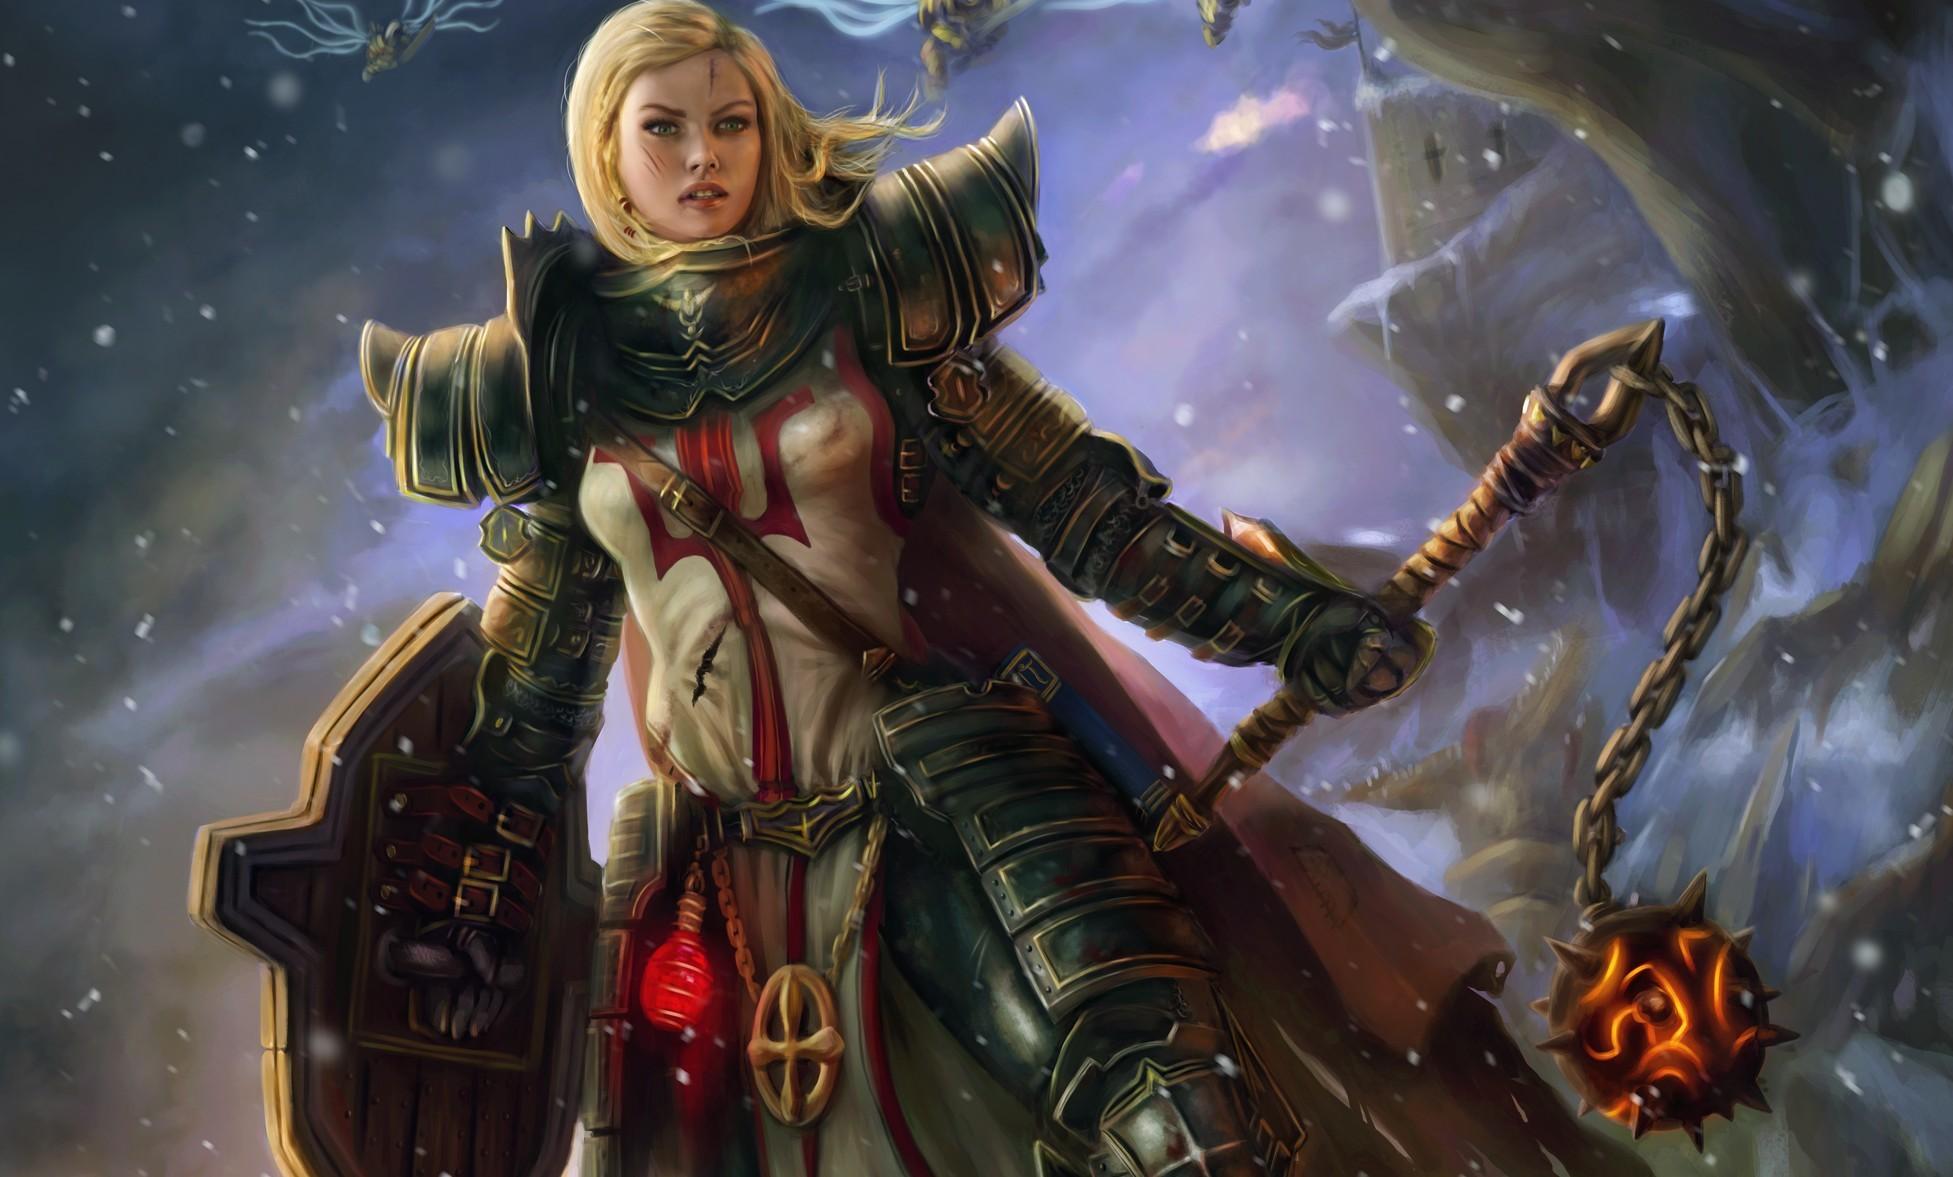 Wallpaper : Anime, Armor, Shield, Diablo III, Mythology